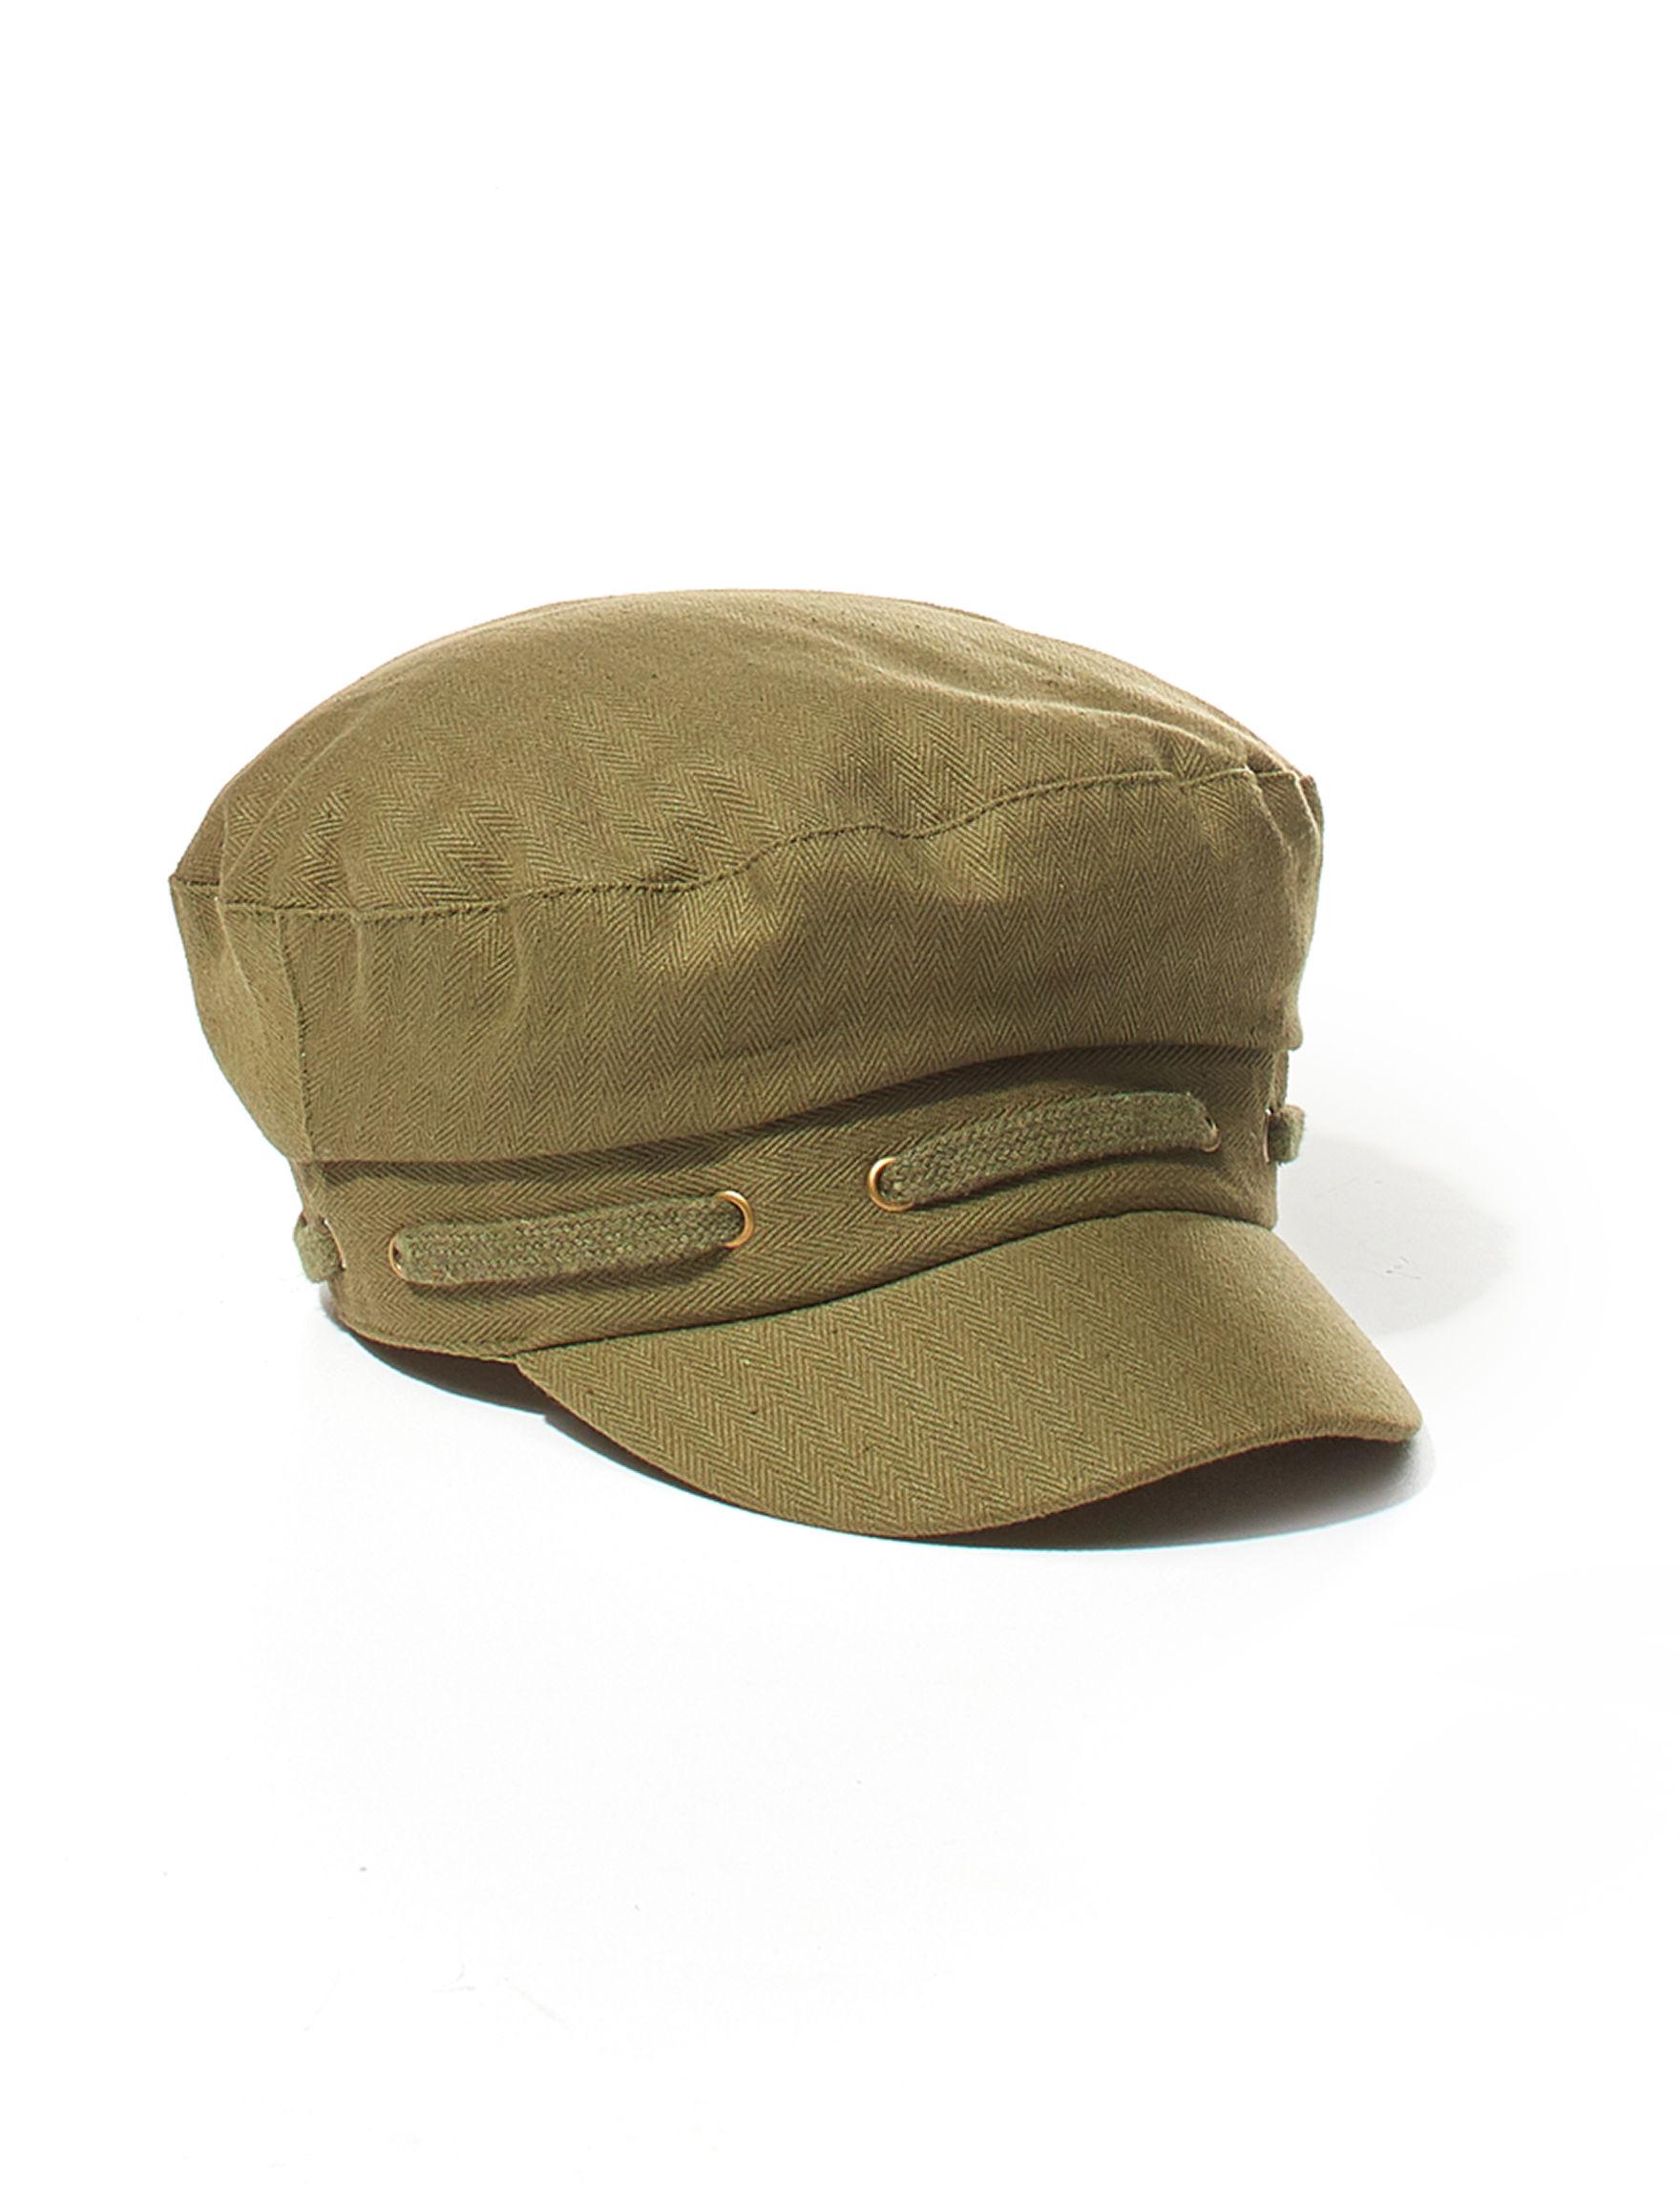 Amiee Lynn Olive Hats & Headwear